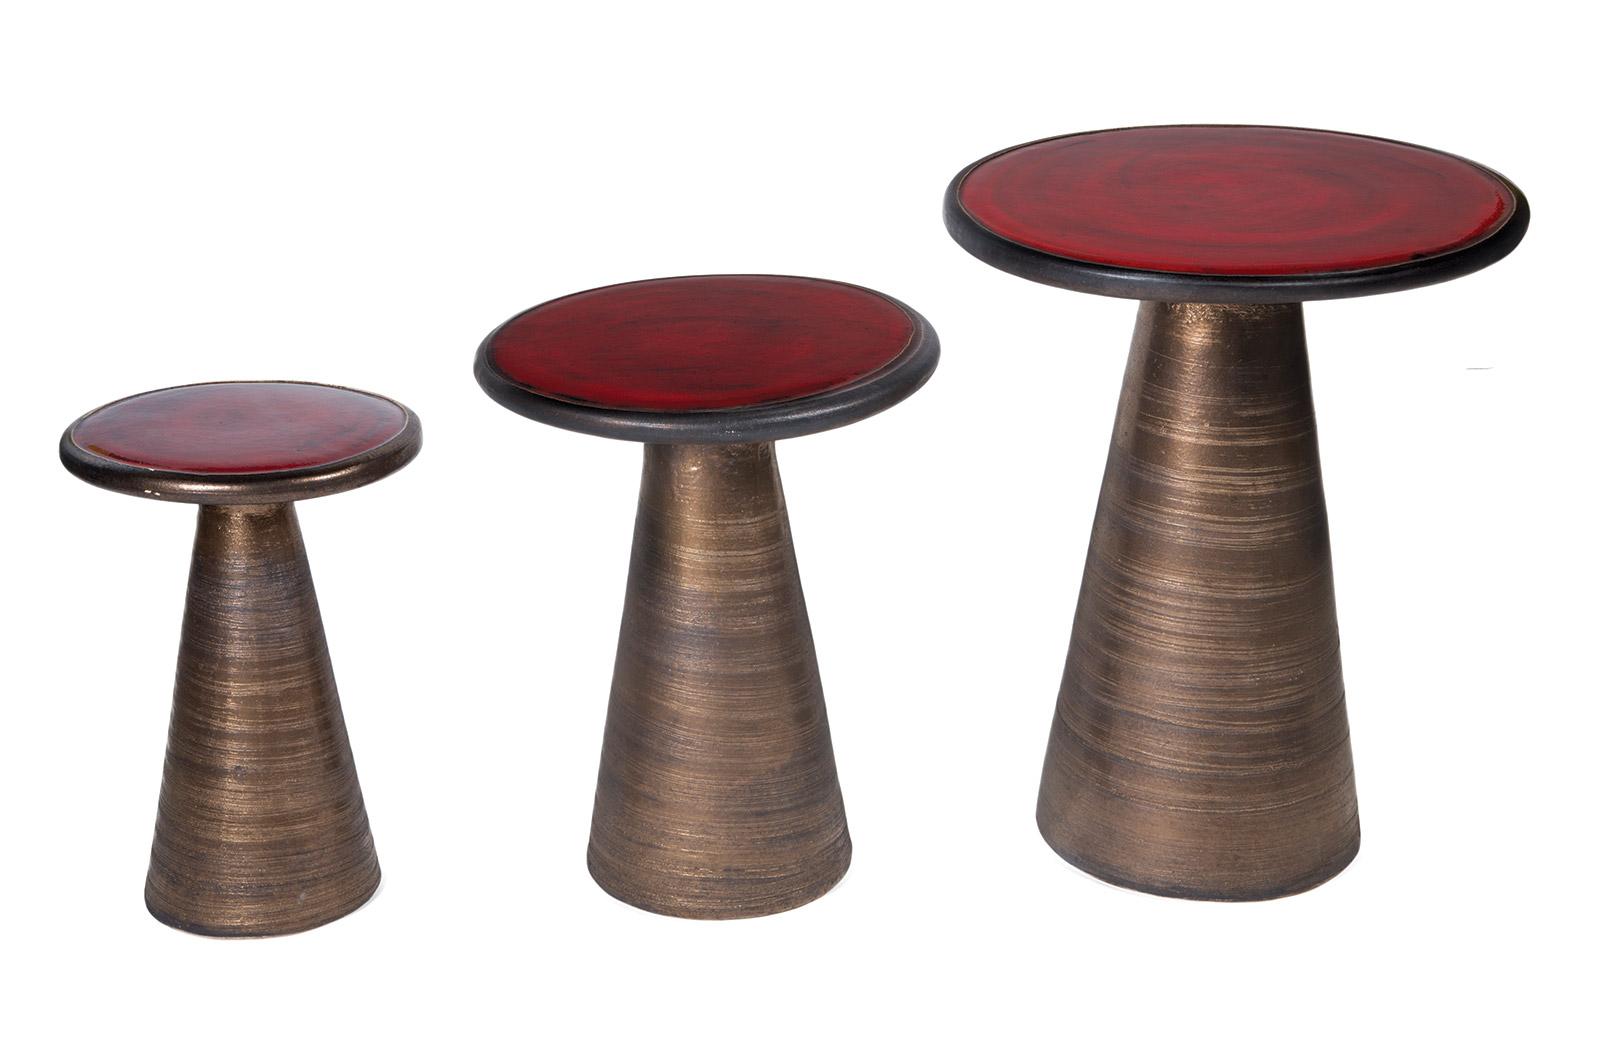 Ceramic Segment Accent Table Set - Seasonal Living